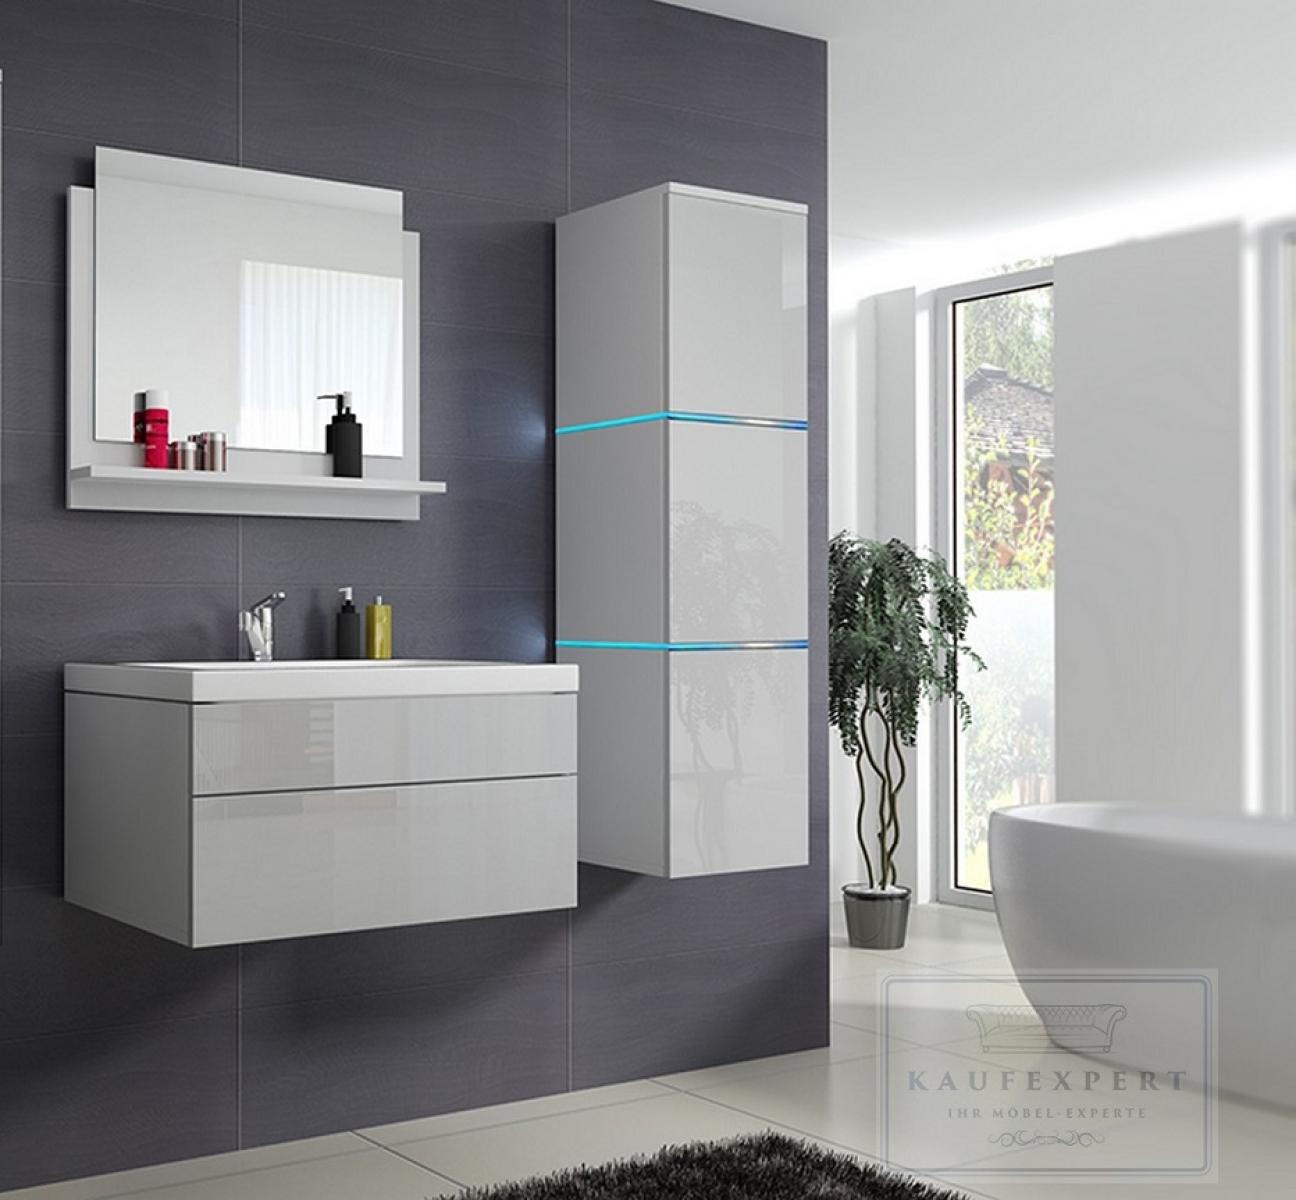 badezimmer keramik | huboonline, Hause ideen